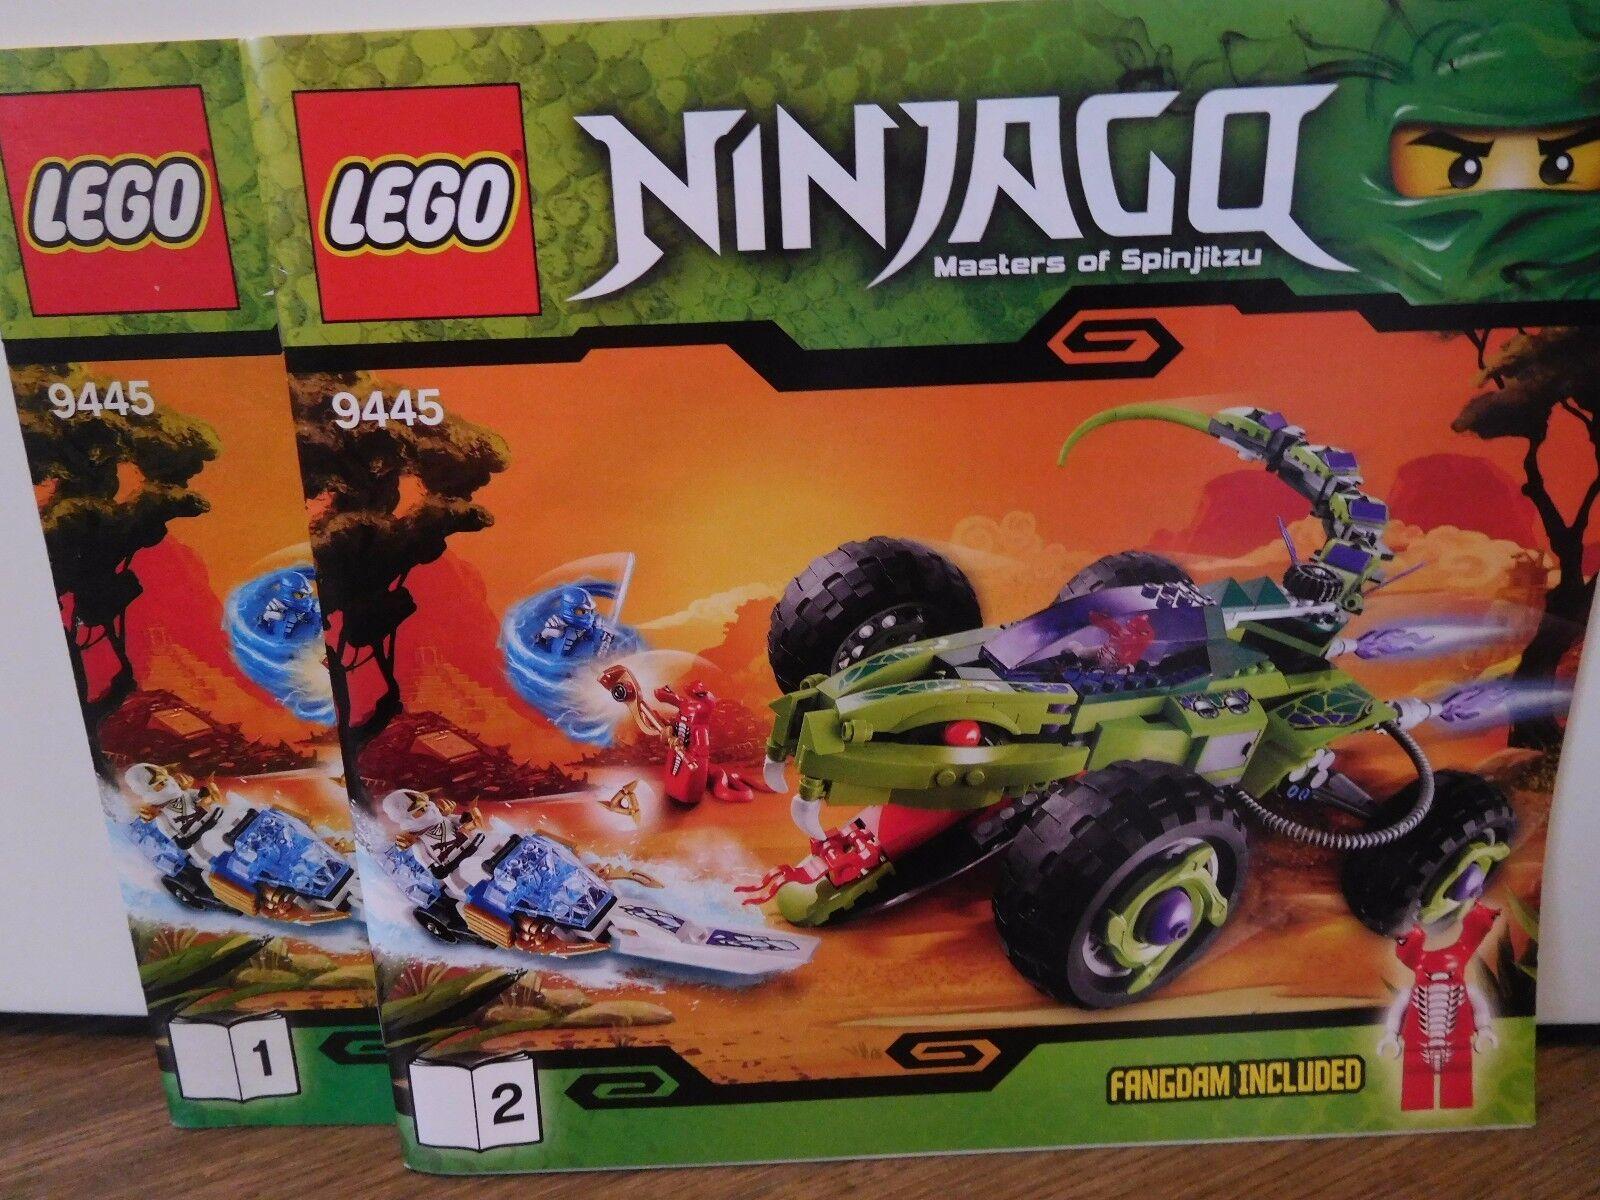 LEGO NINJAGO Schlangen-Quad (9445) (9445) (9445) mit Bauanleitungen 40e516